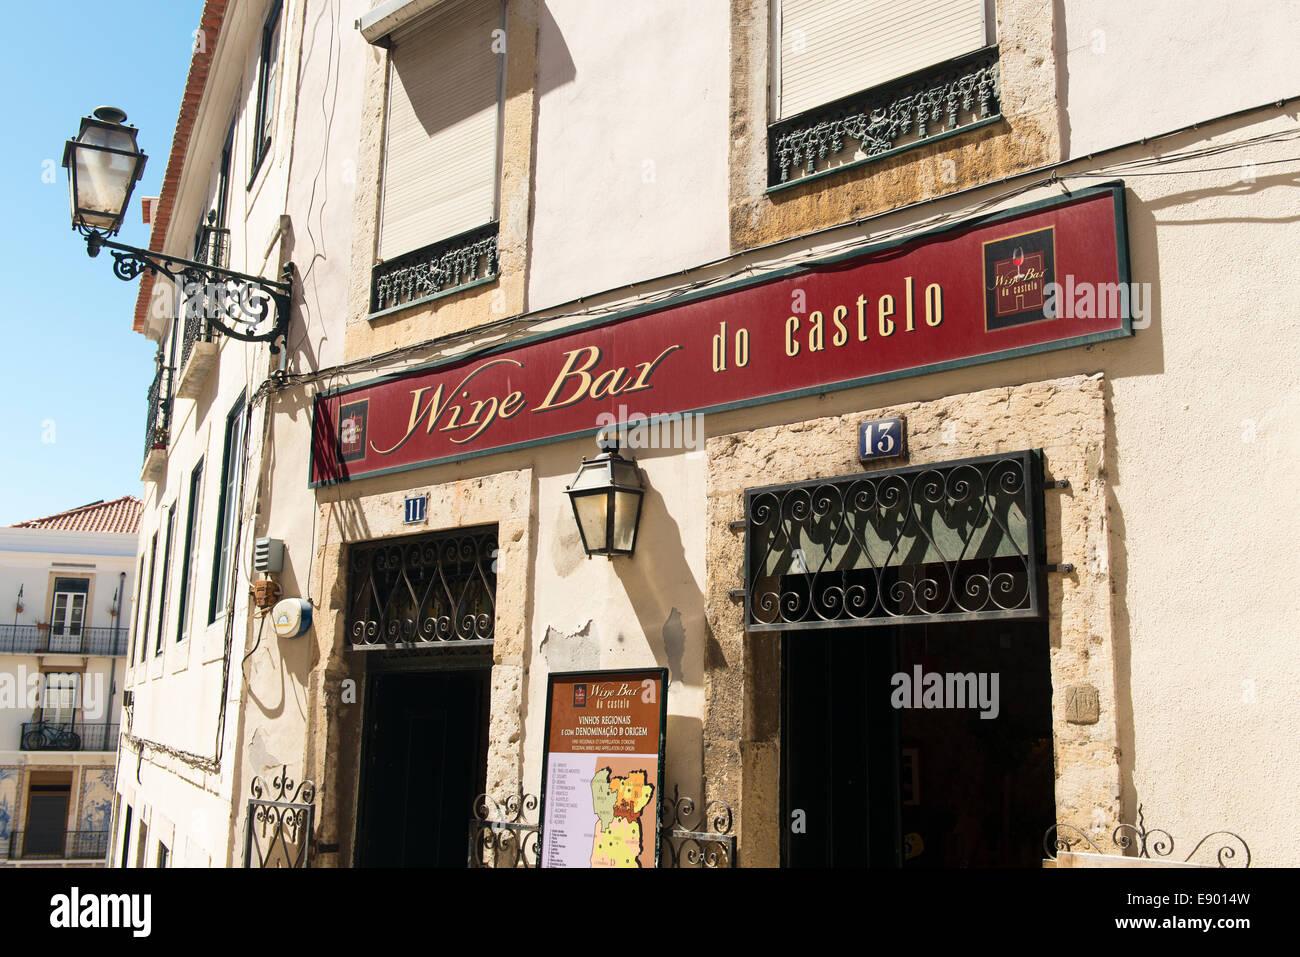 Portugal Lisbon Alfama Wine Bar do Castelo popular venue close to castle Sao Jorge - Stock Image